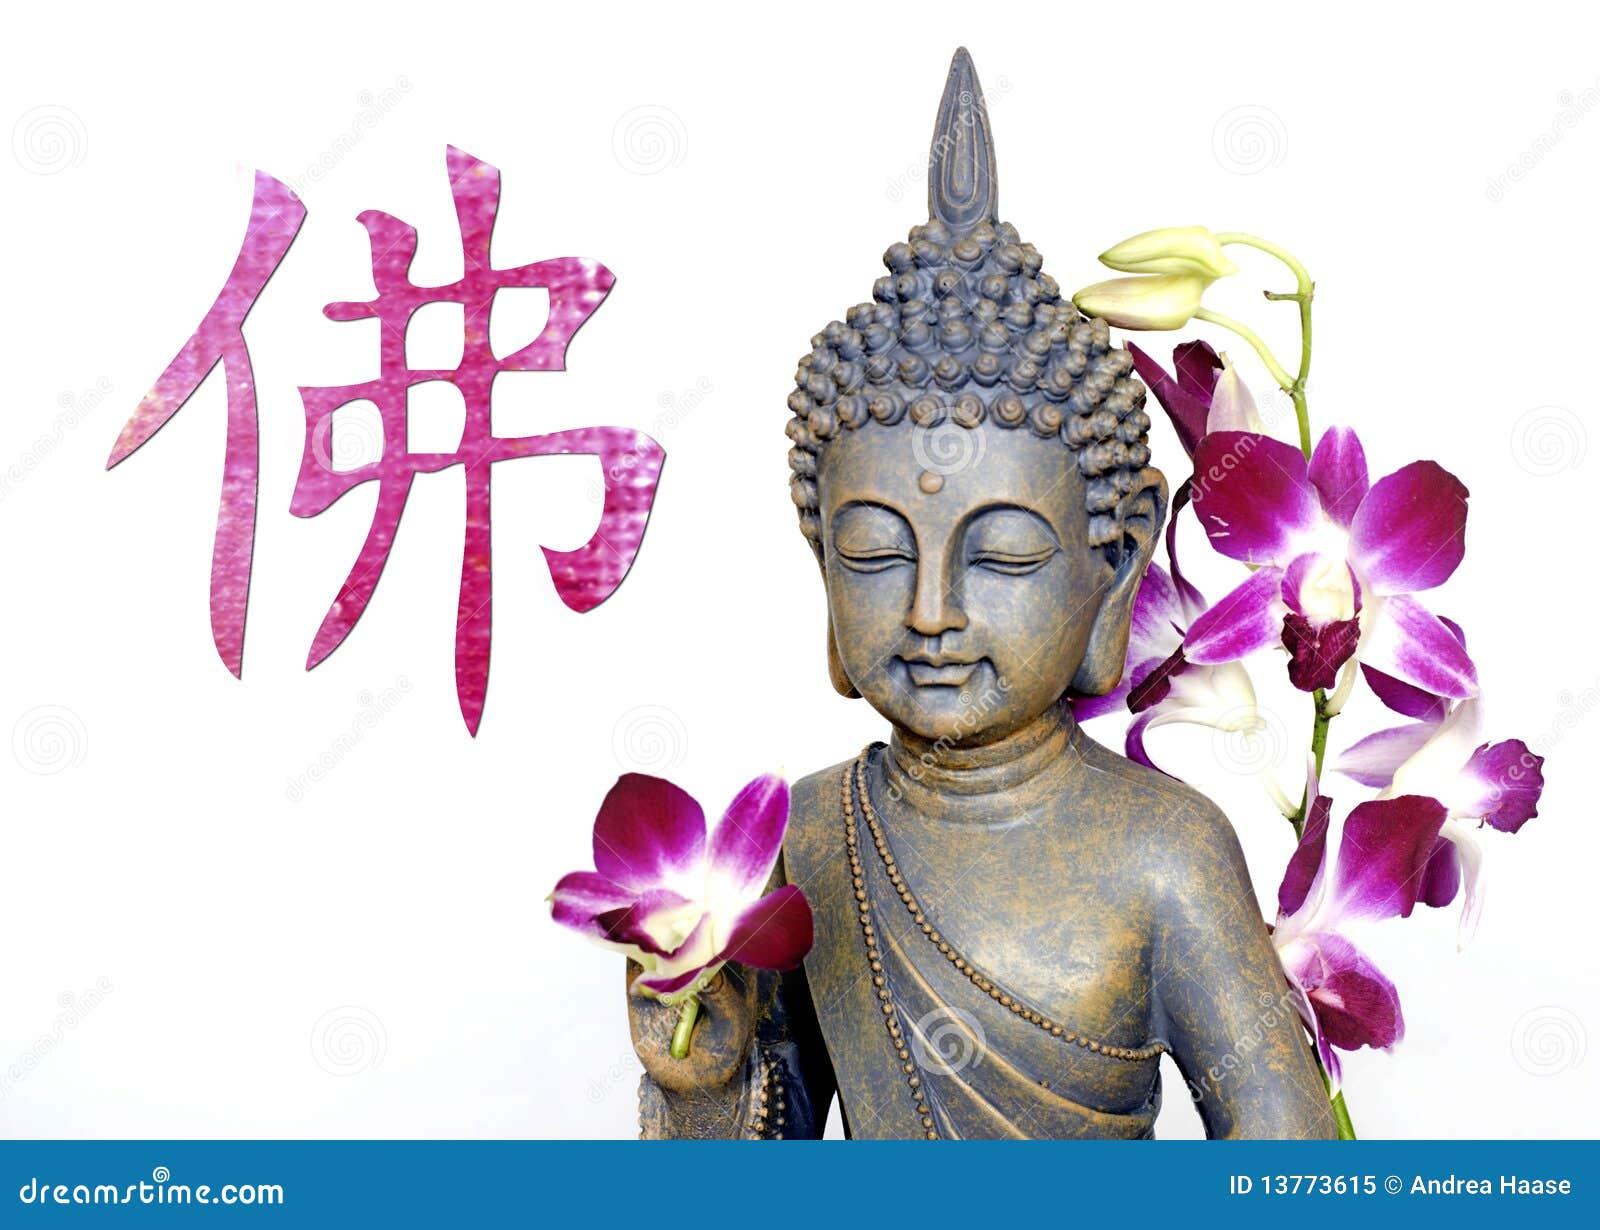 bouddha et symbole chinois pour bouddha image stock. Black Bedroom Furniture Sets. Home Design Ideas